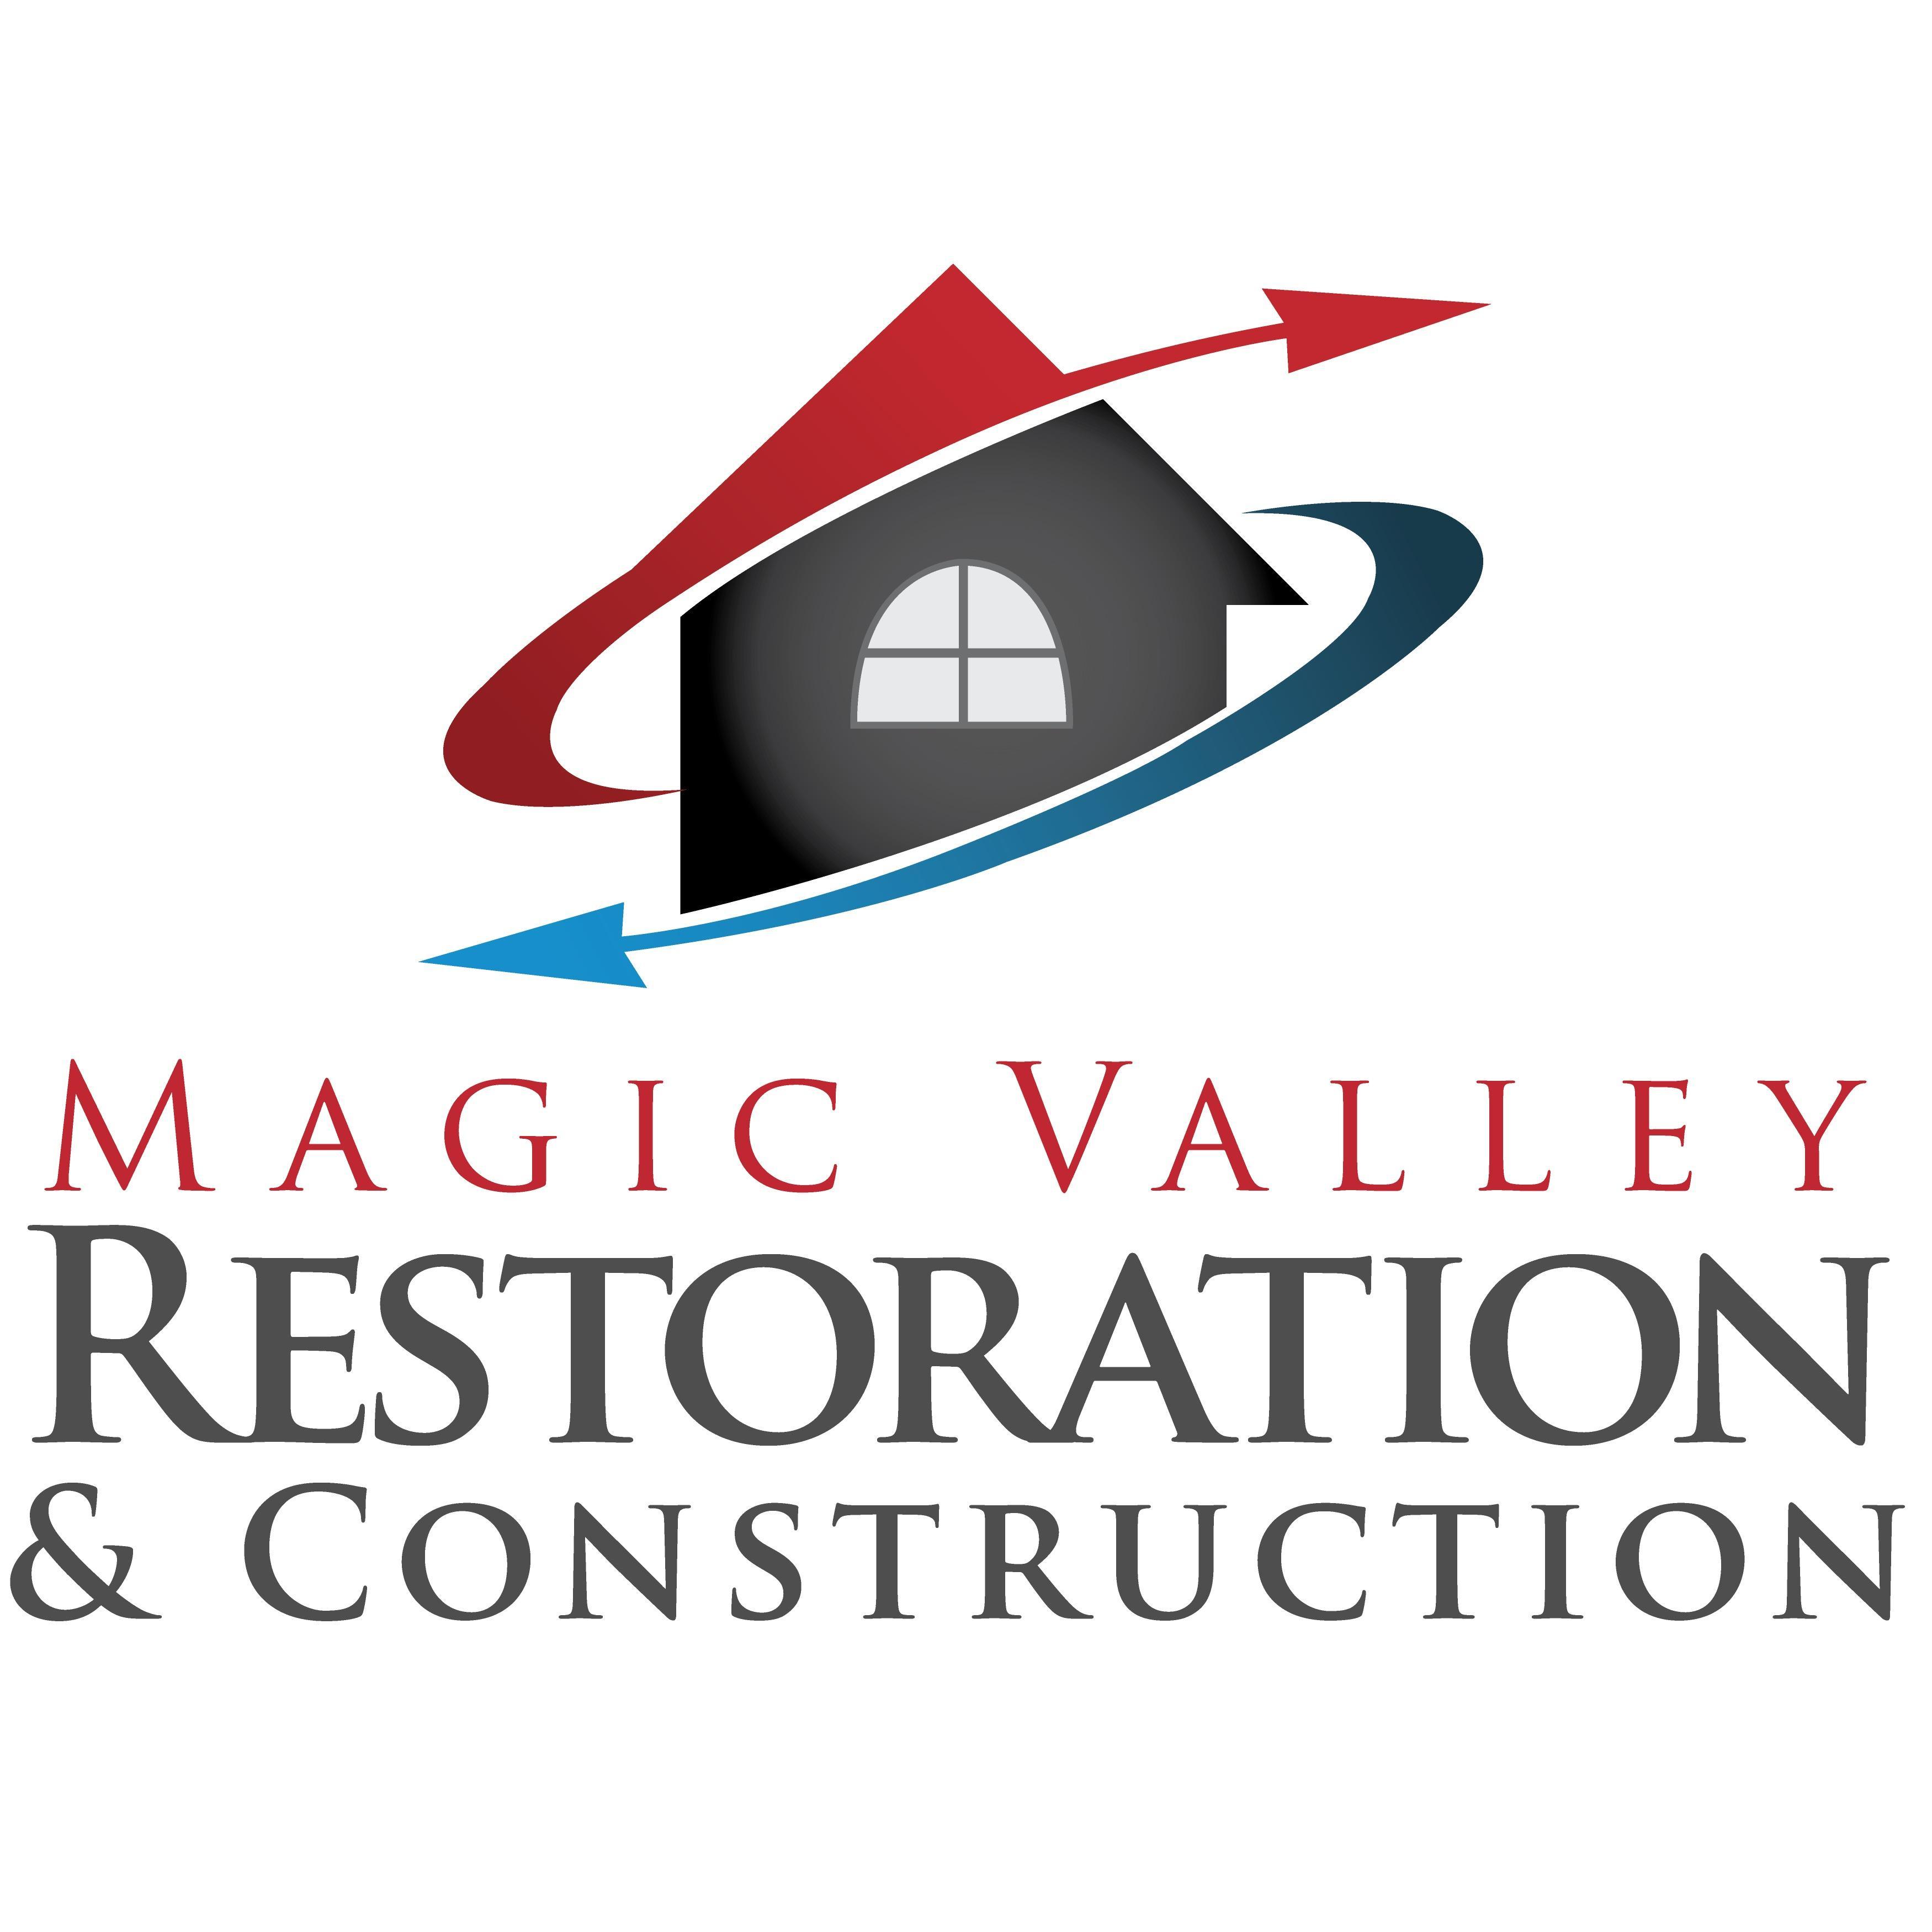 Magic Valley Restoration & Construction image 0